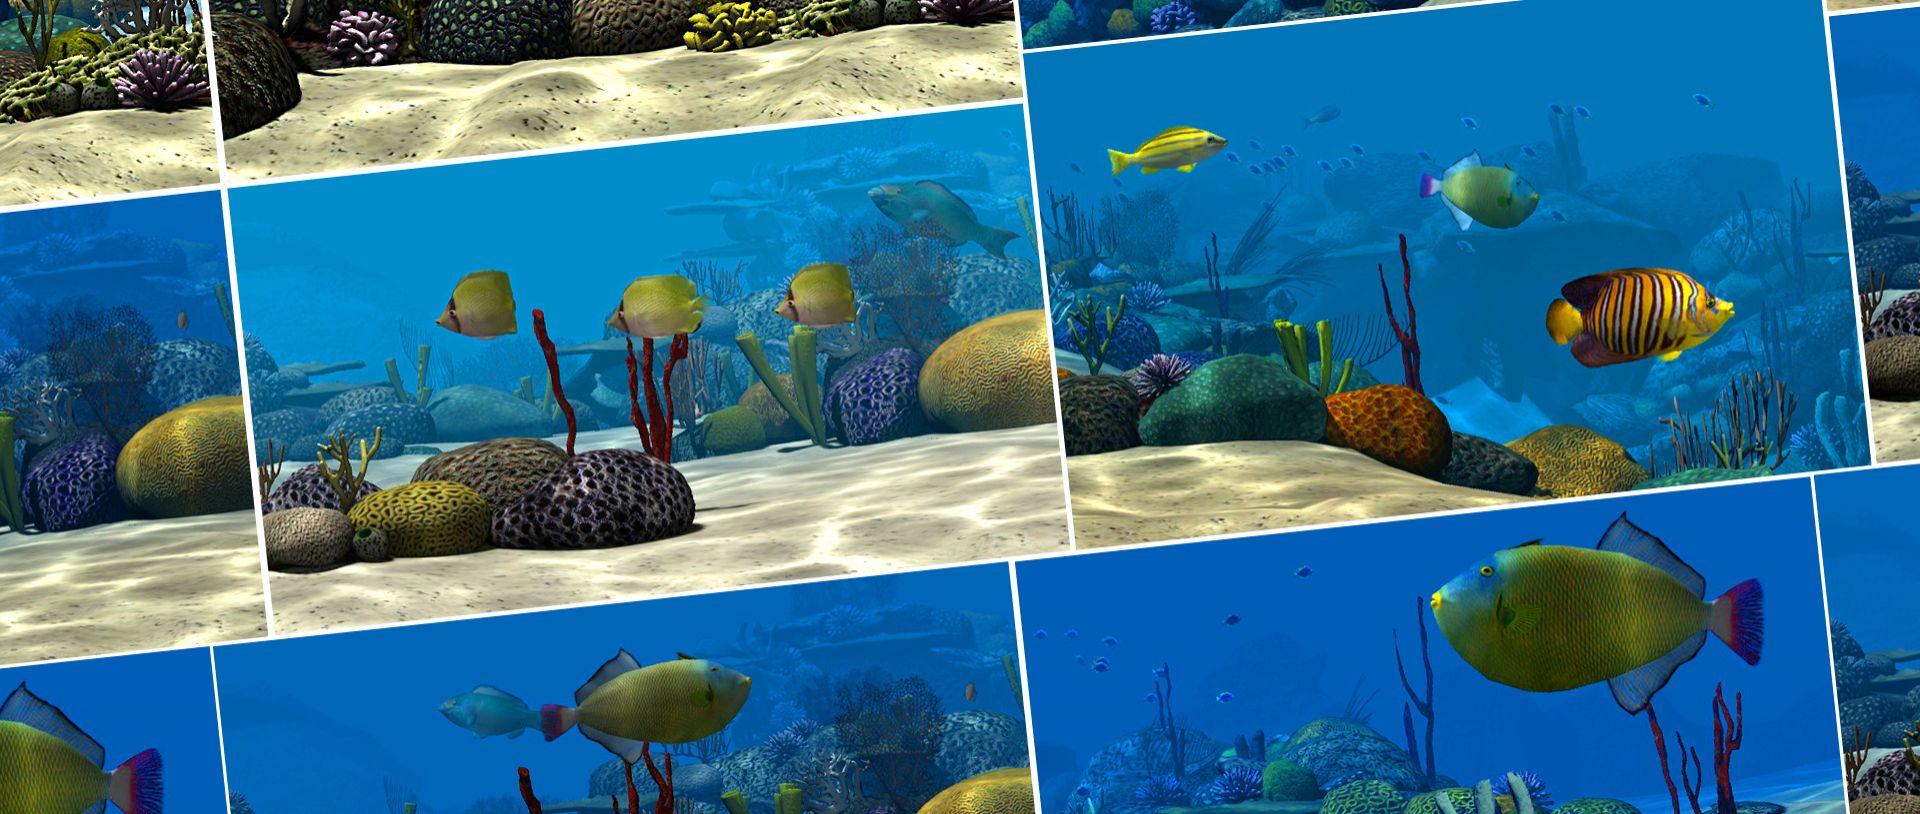 SaarLB - Landesbank Saar - Schaufensterinstallation - Interactive Shopping Window - Interactive Window - Underwater World - 3D World - Interactive Experience - realtime visions